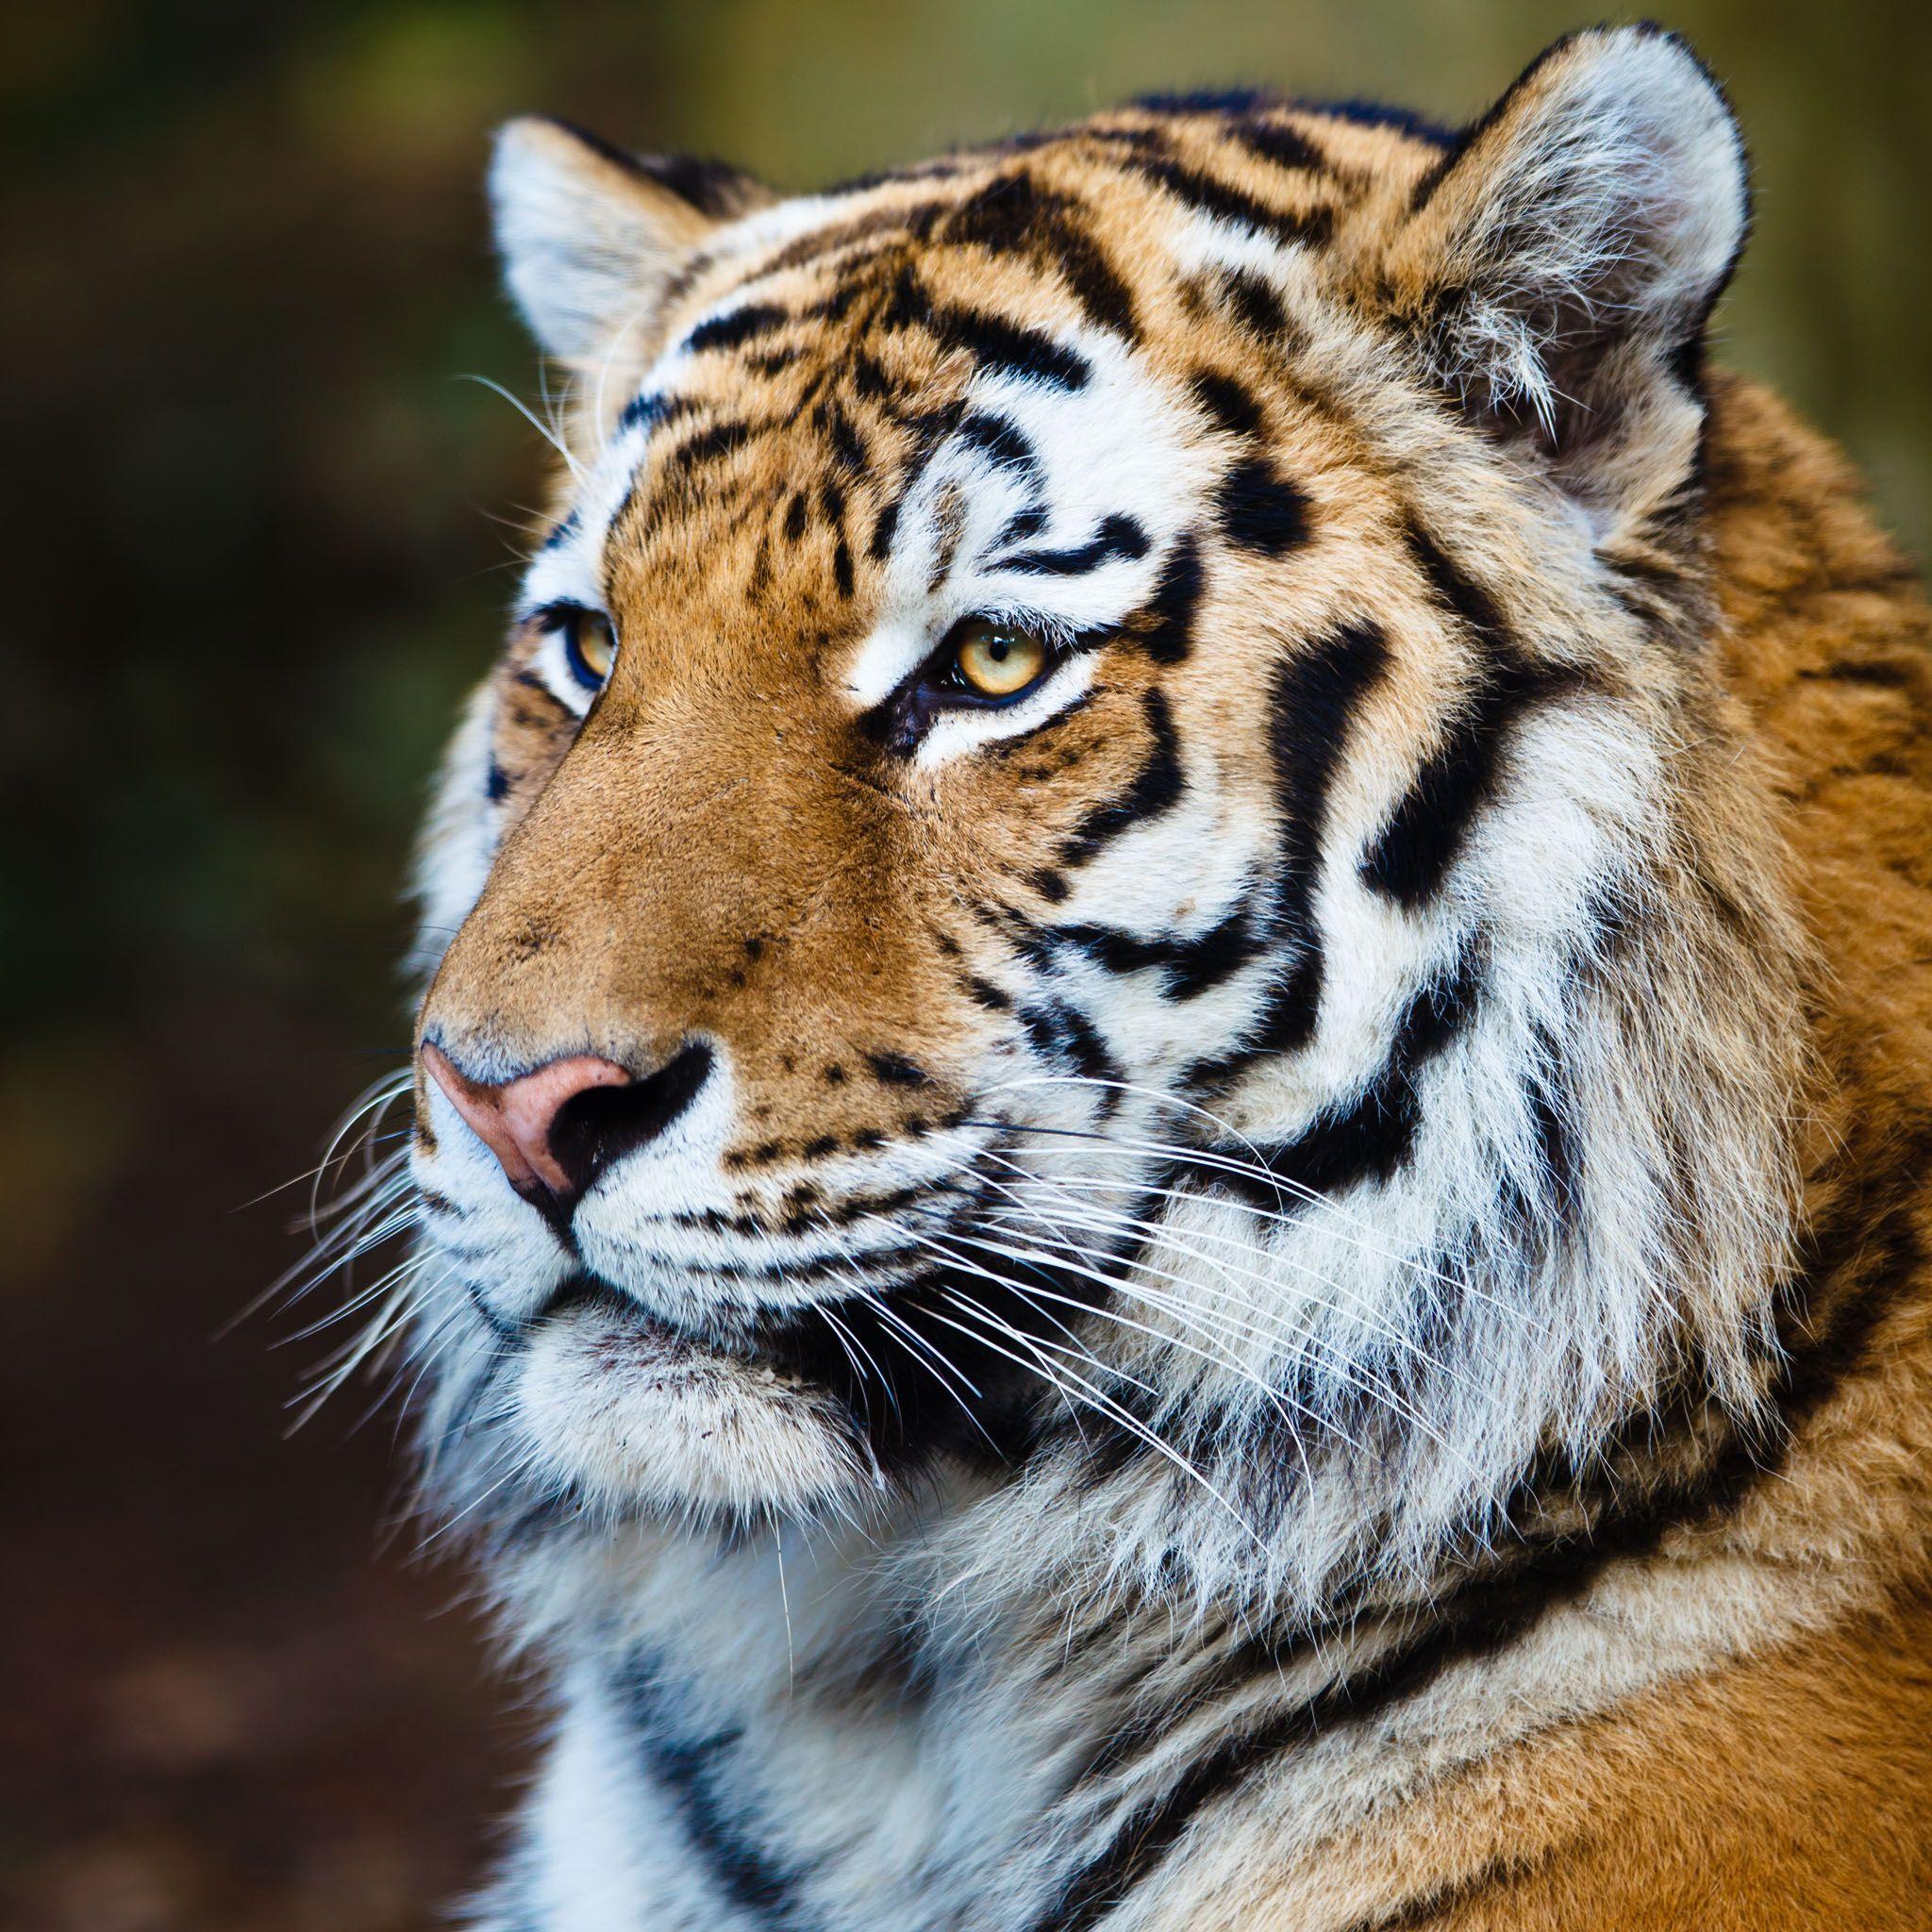 Proud Siberian Tiger Hd Ipad Wallpapers Sibirischer Tiger Tiere Und Vogel Raubtiere